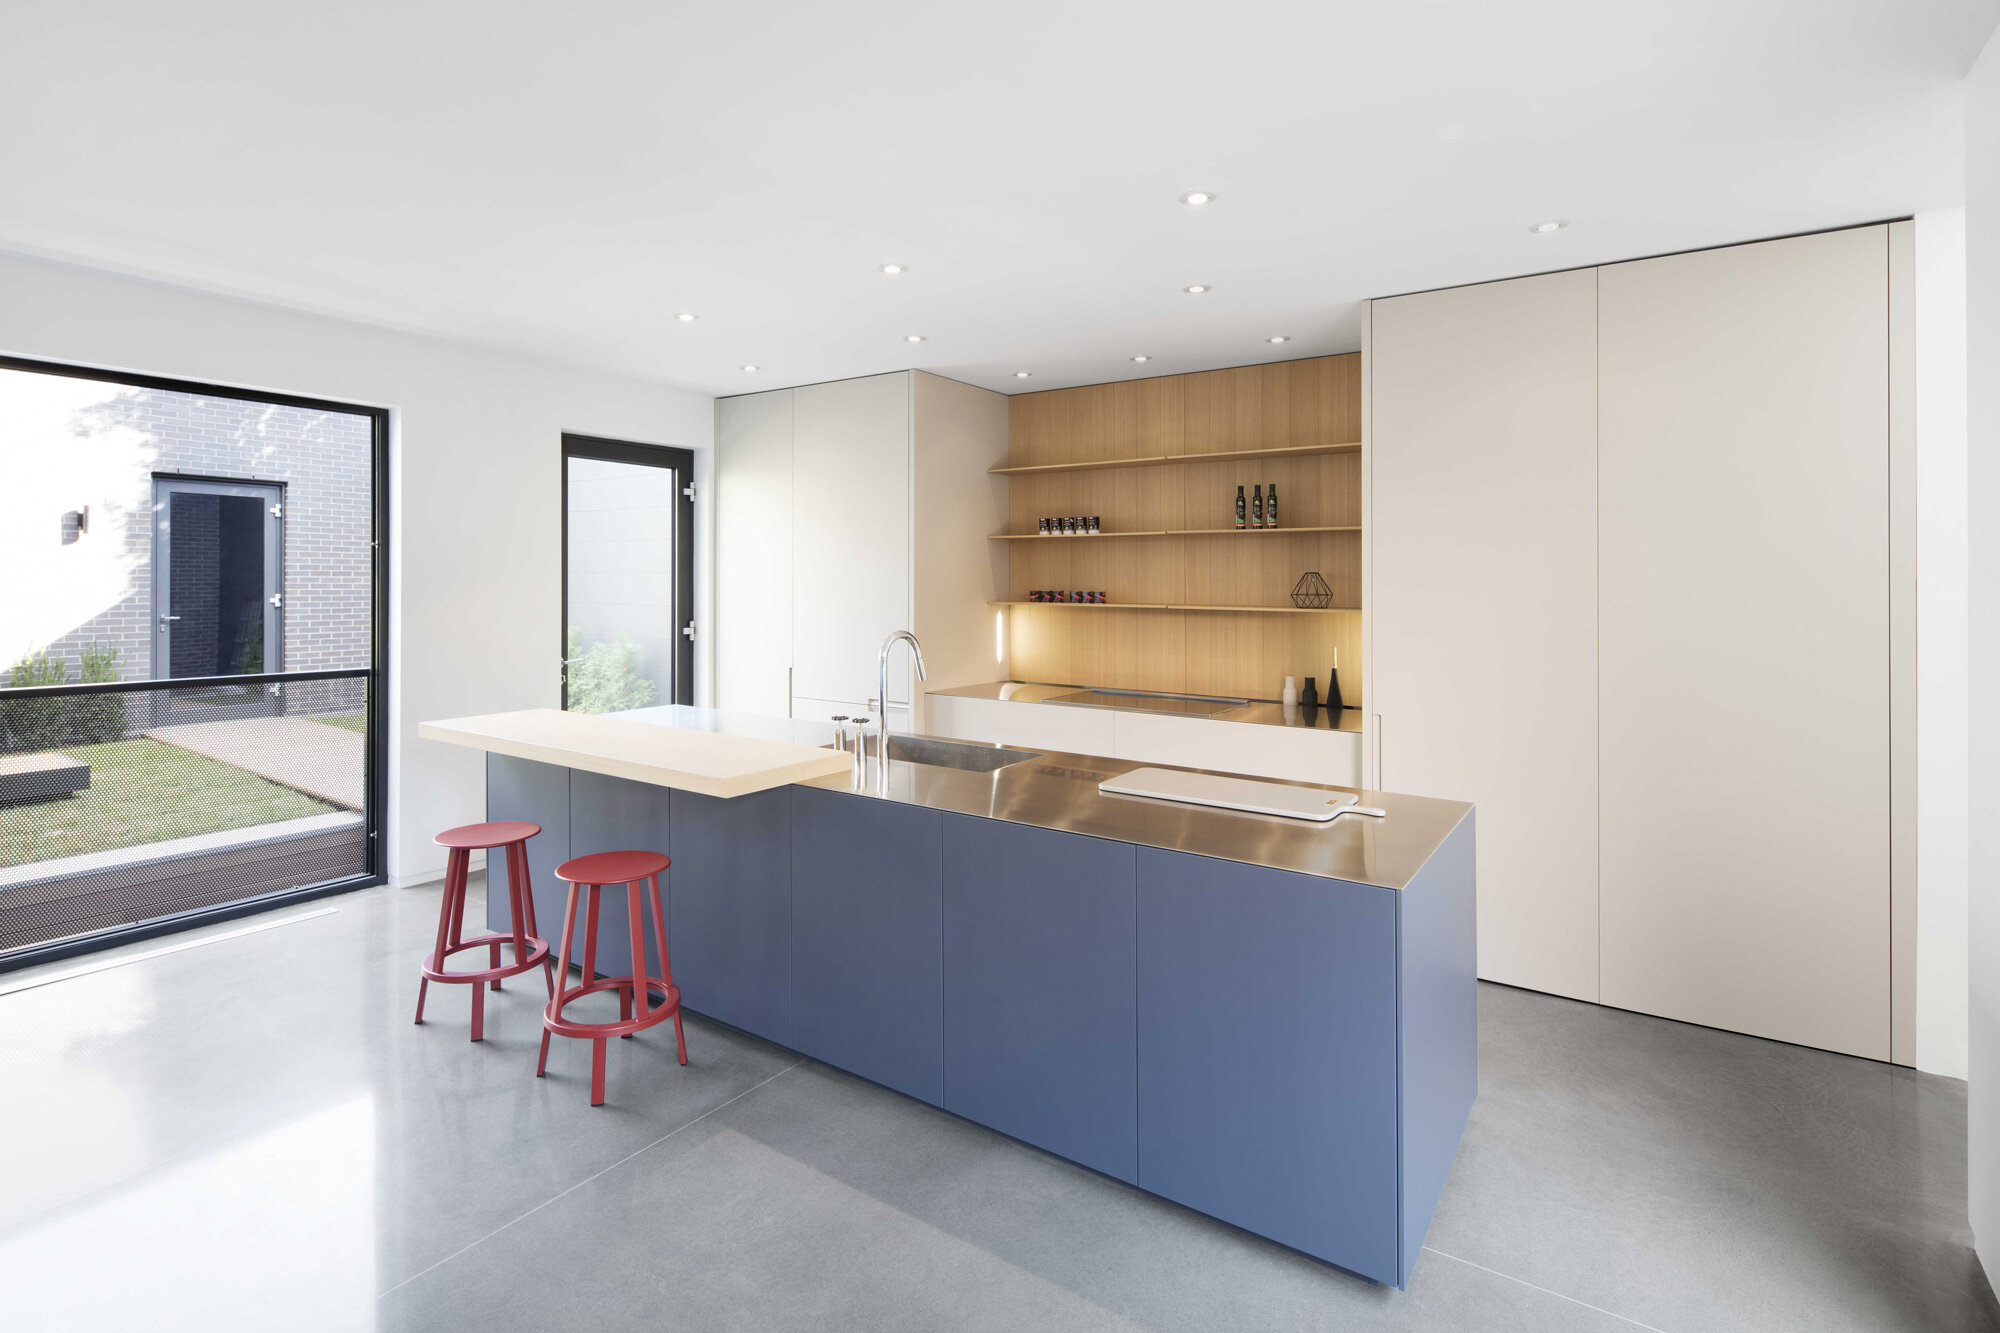 Kitchen, Bath & Home Design and Remodel Center - Elite ...